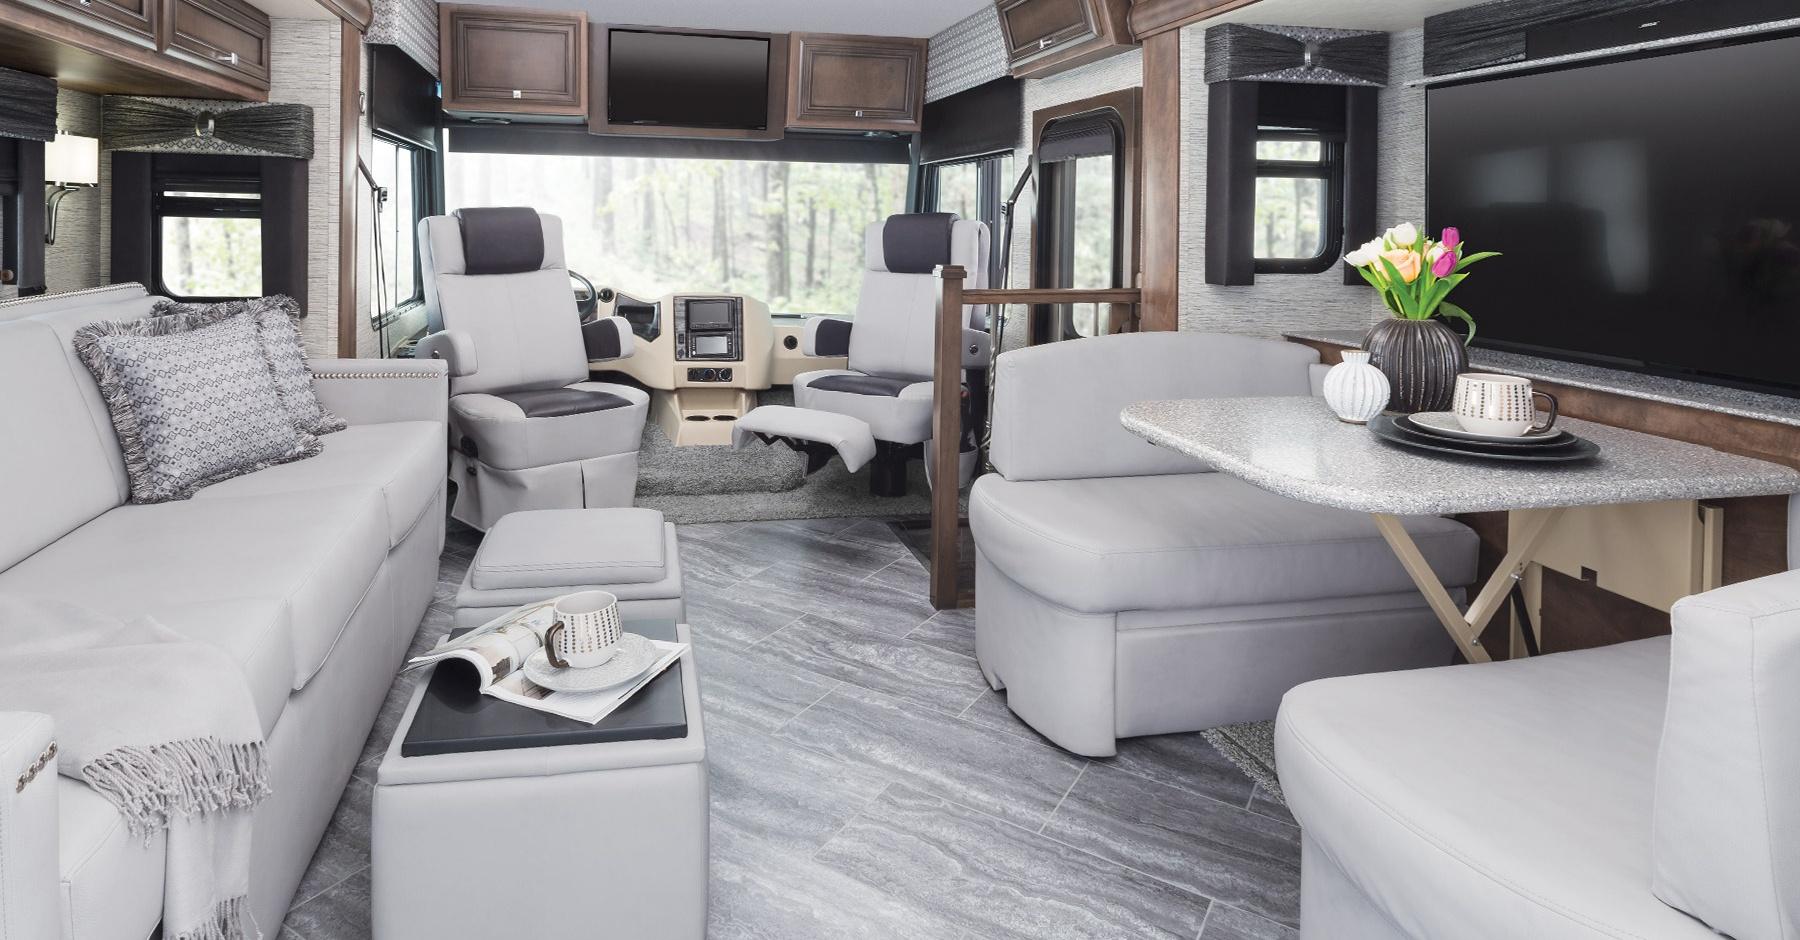 Six 2019 motorhomes, including Tiffin Open Road Allegro, Newmar Bay Star, Coachmen Leprechaun, Winnebago Fuse, Pleasure-Way Lexor TS, Midwest Automotive Designs Weekender